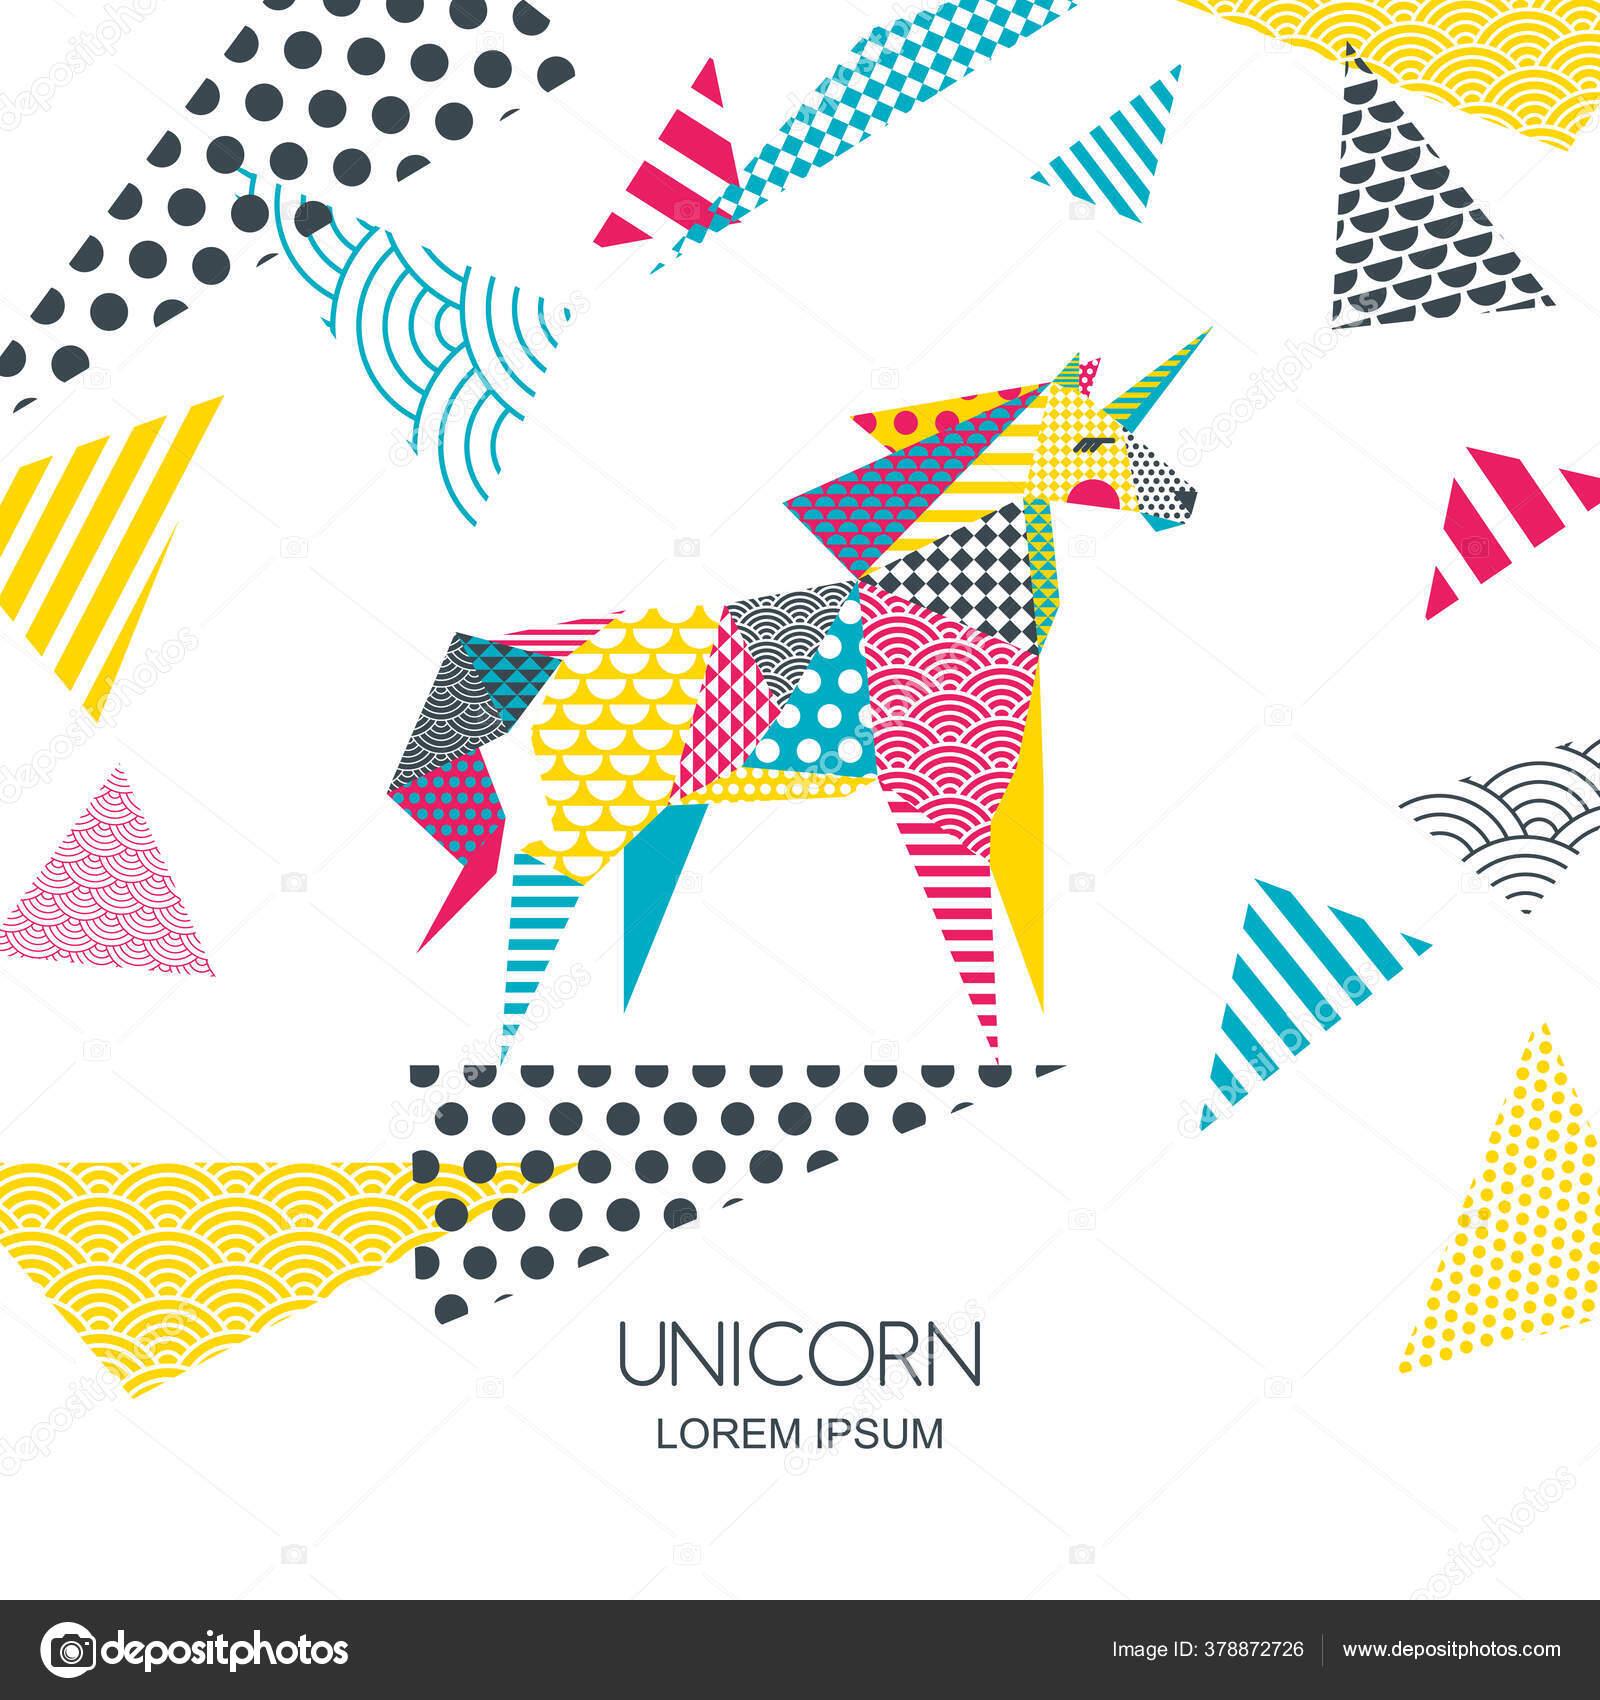 Vector Color Illustration Unicorn Horse Patchwork Geometric Triangle Texture Creative Stock Vector C Betelgejze 378872726